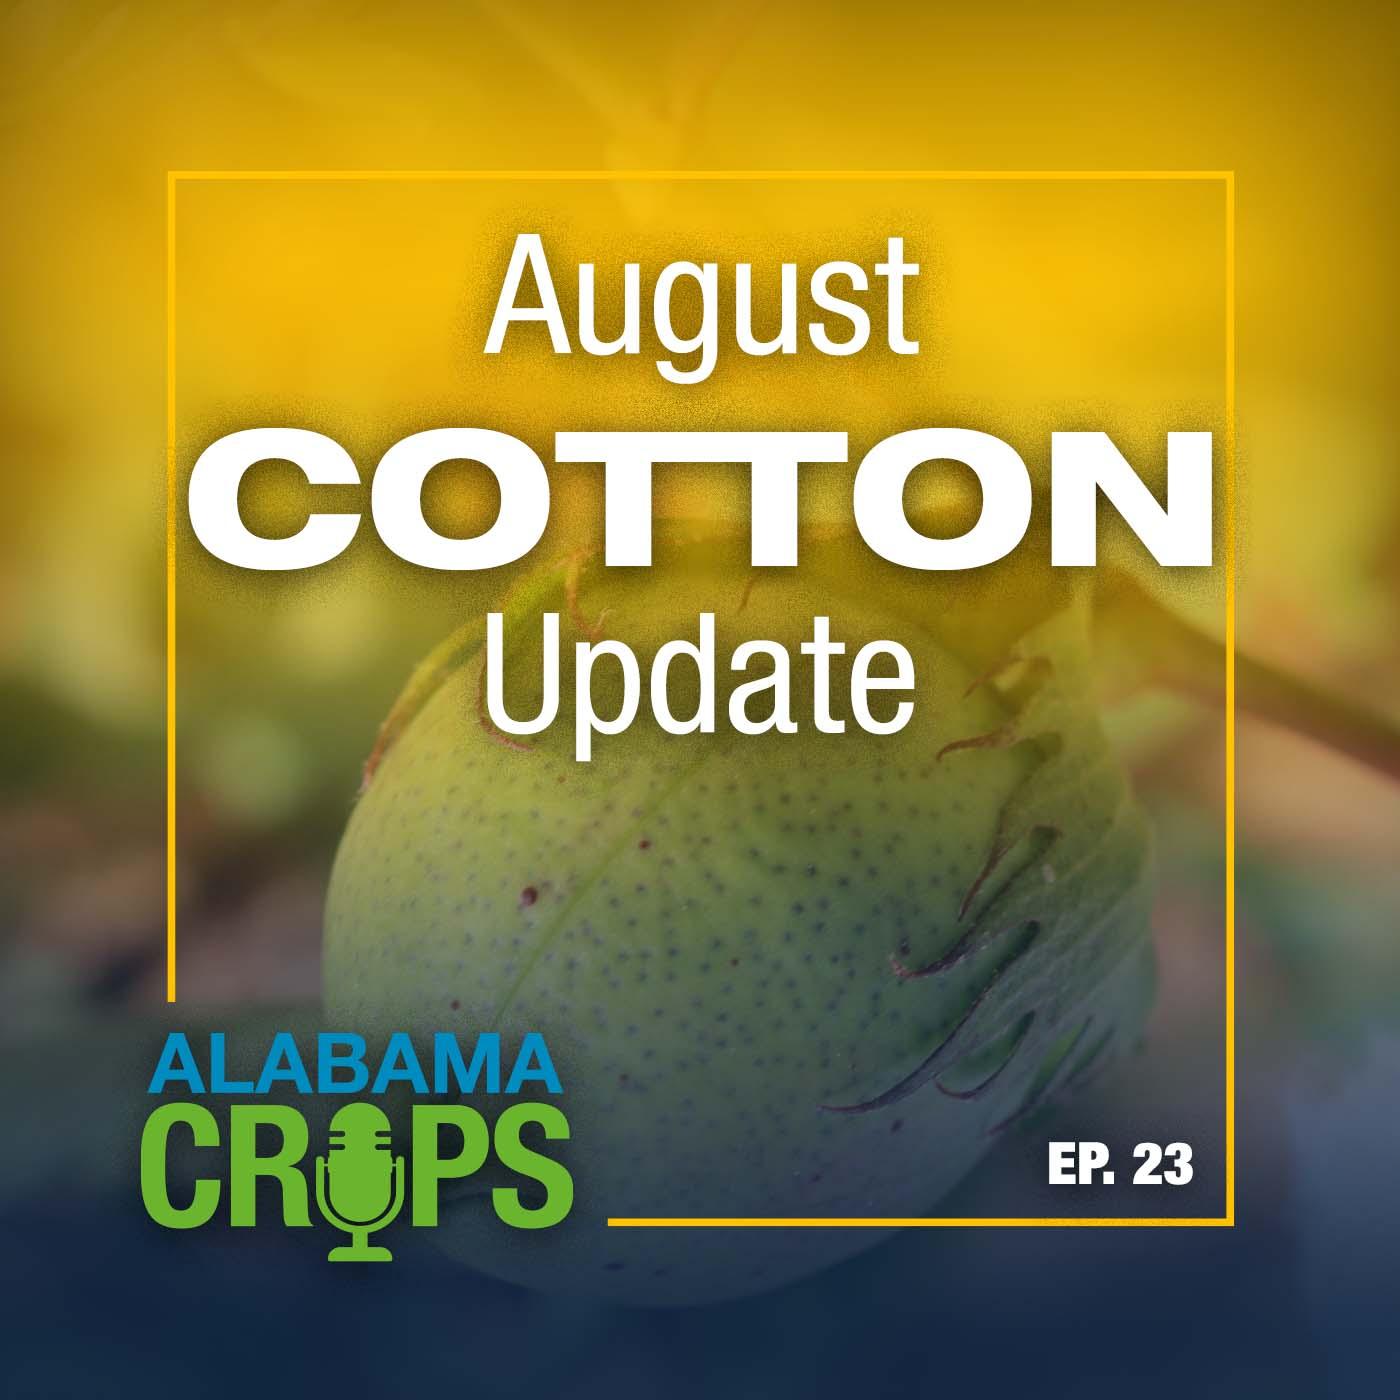 August Cotton Update Alabama Crops Report Episode 23